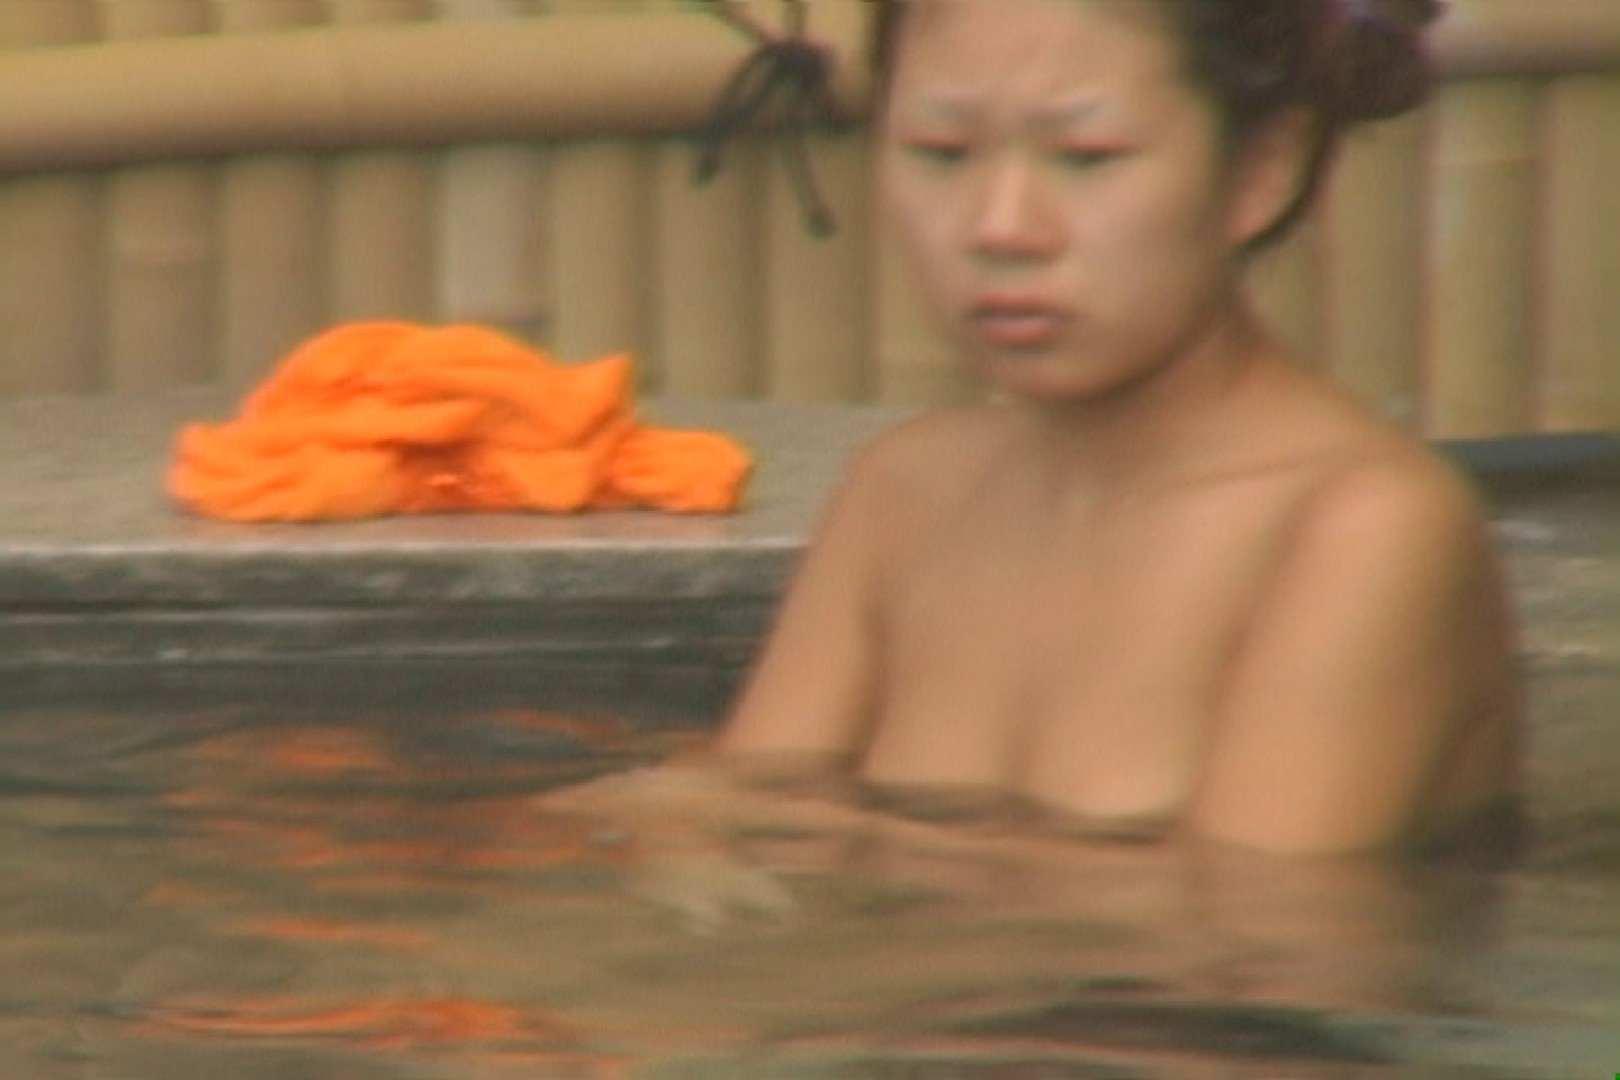 Aquaな露天風呂Vol.581 盗撮特撮  12pic 6